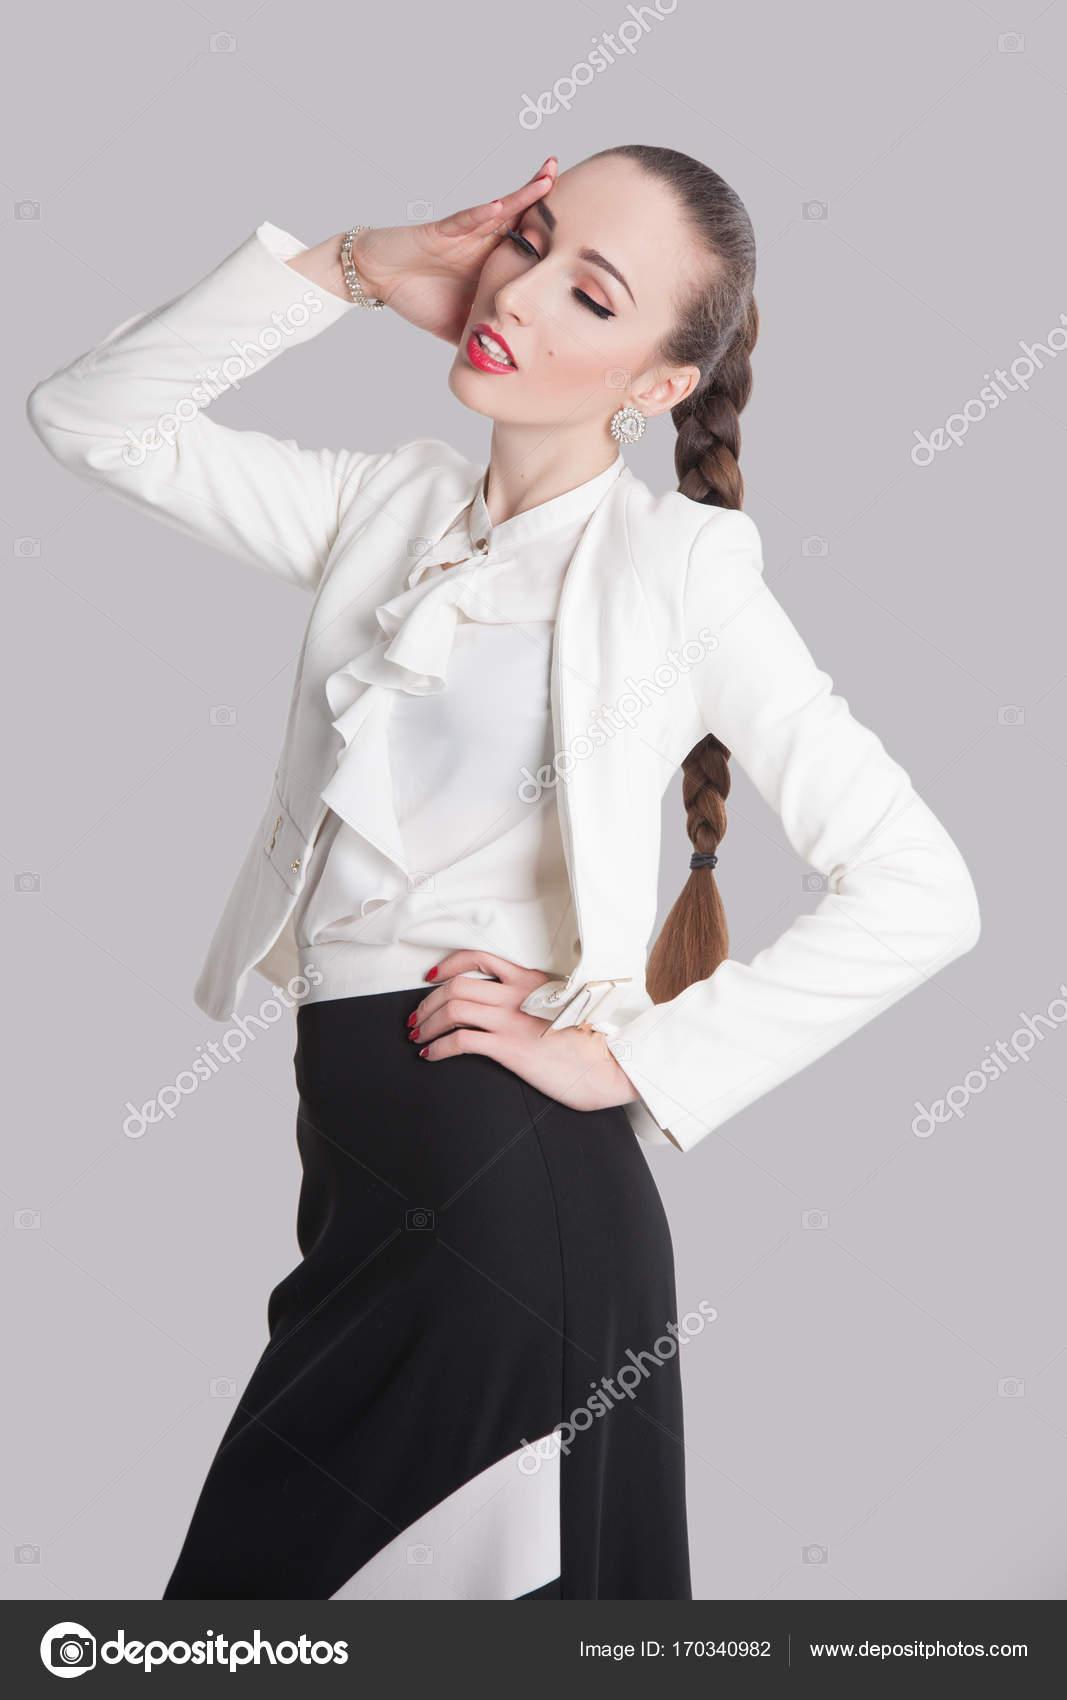 fe959693e711 Frau posiert in weißen Hemd und Rock — Stockfoto © luzgareva #170340982